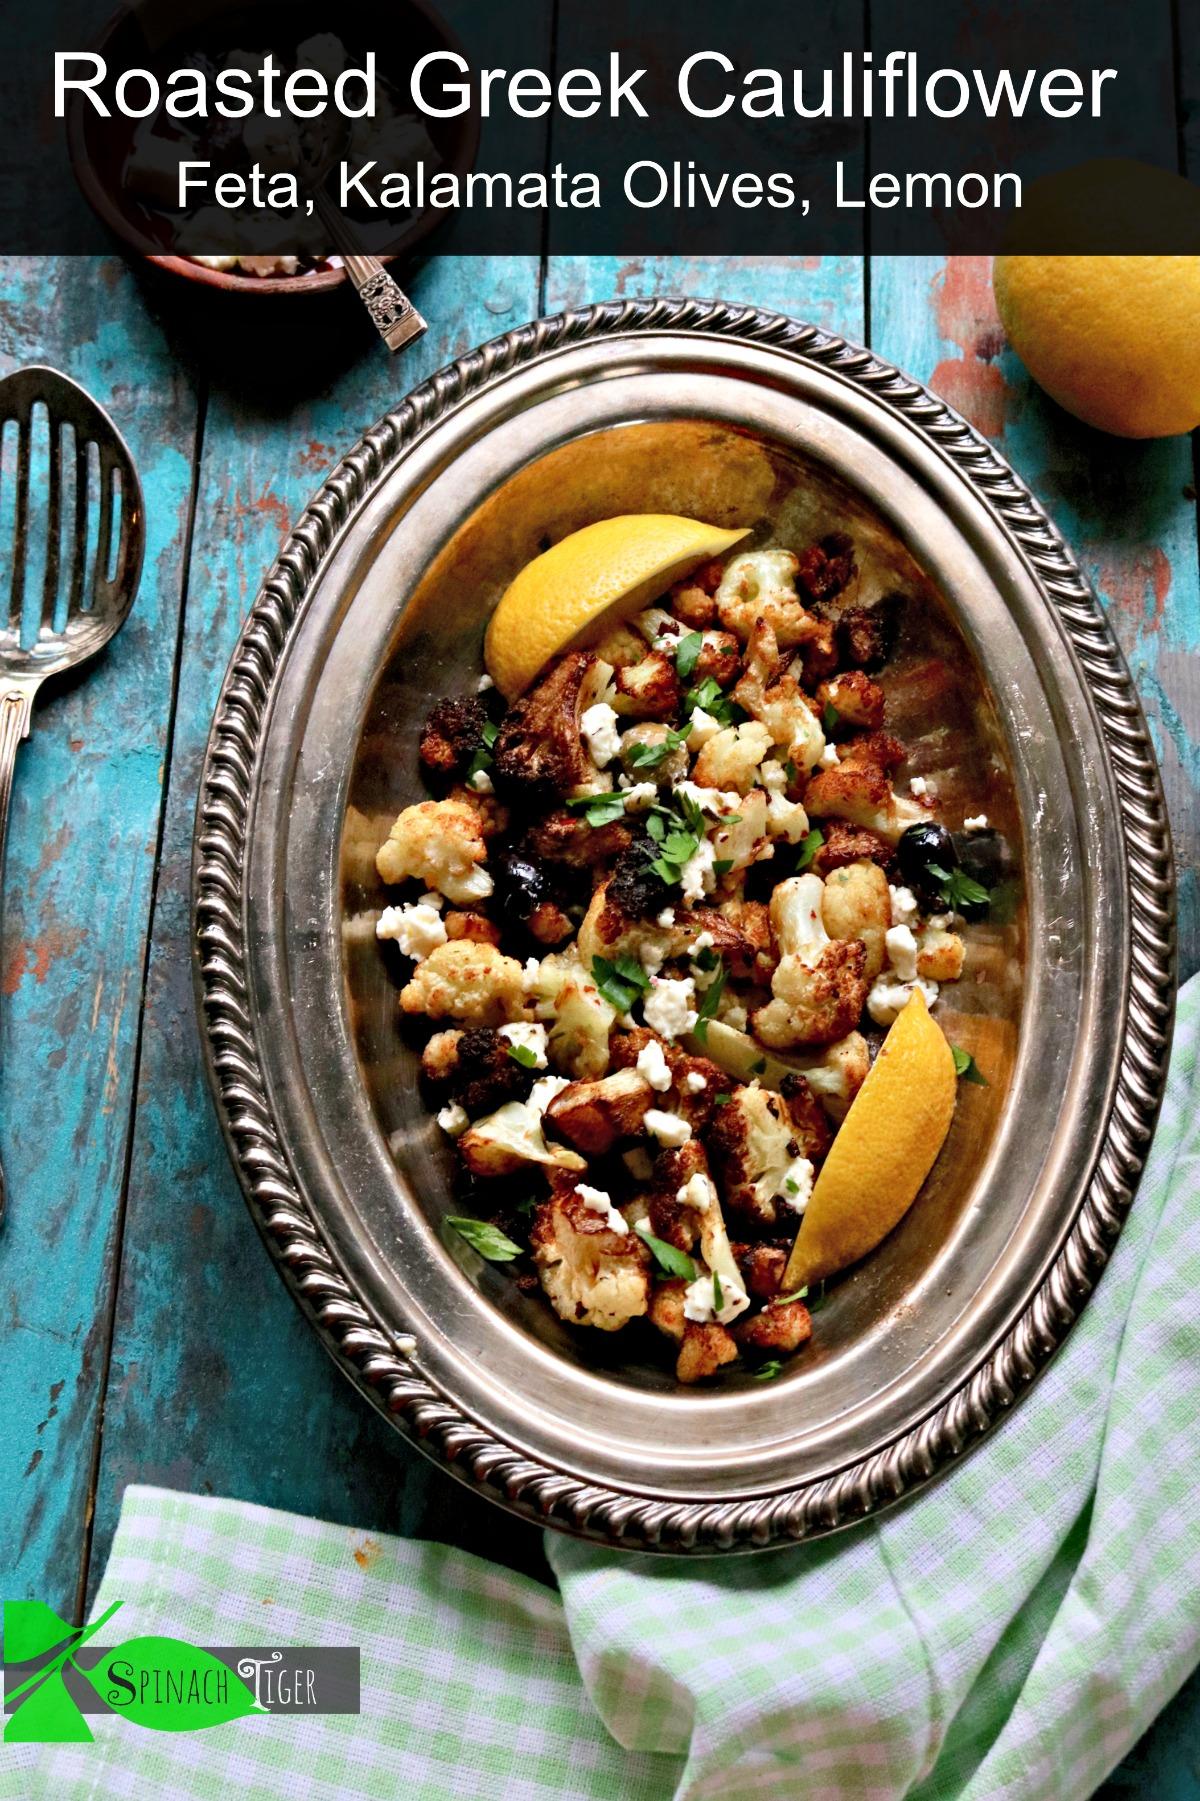 Flash Fried Greek Cauliflower via @angelaroberts